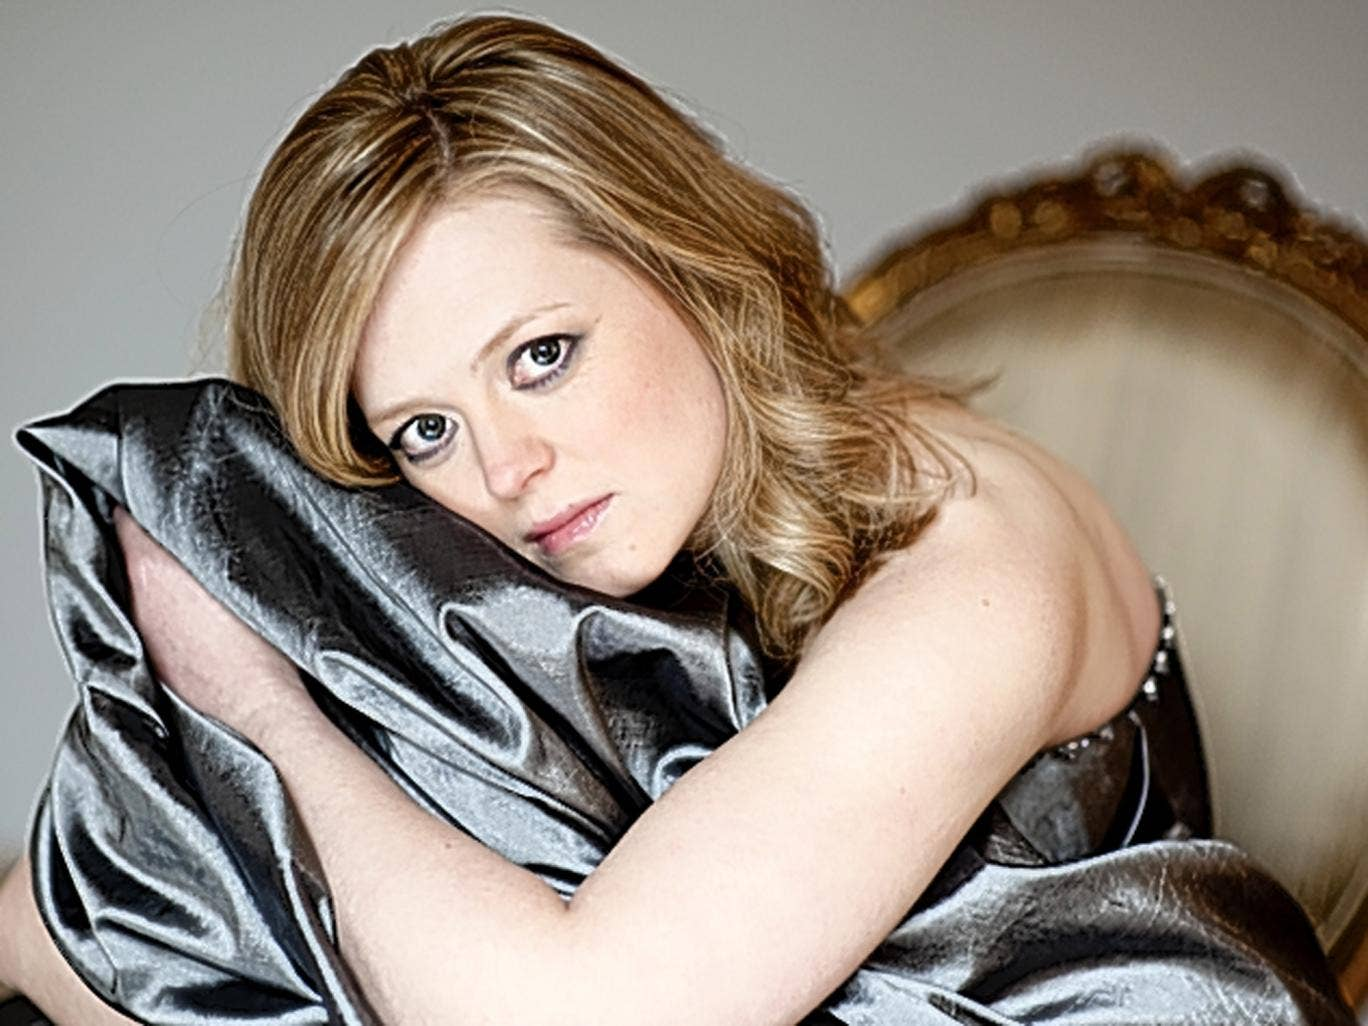 Carroll singer: the Welsh soprano Fflur Wyn is set to take the lead role in 'Alice's Adventures in Wonderland'